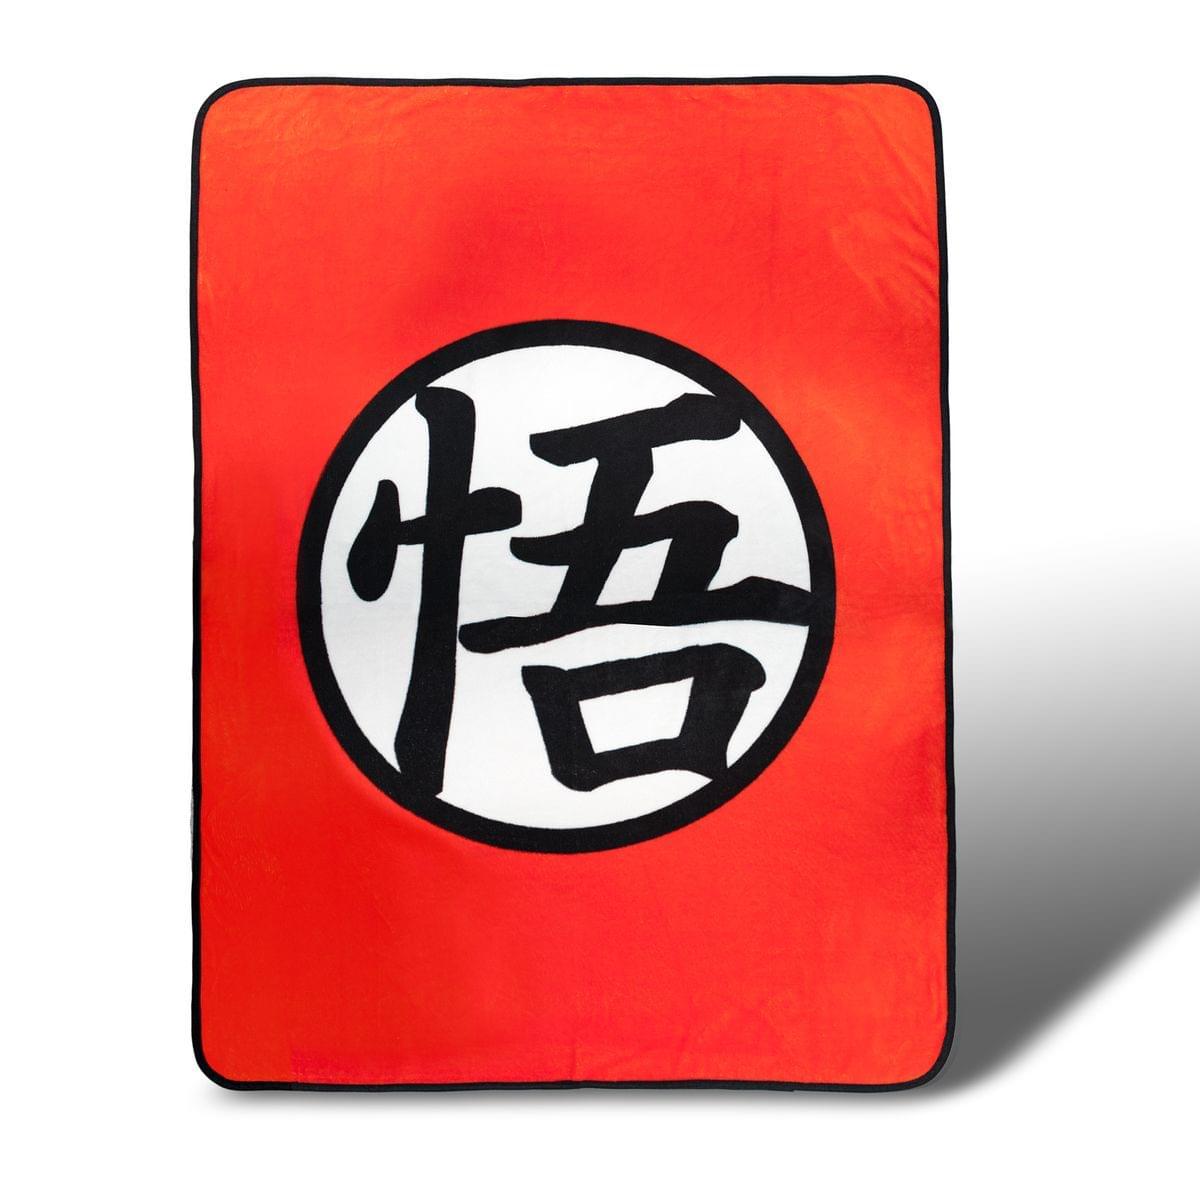 Dragon Ball Z Custom Goku Symbol Lightweight Fleece Blanket | 45 x 60 Inches